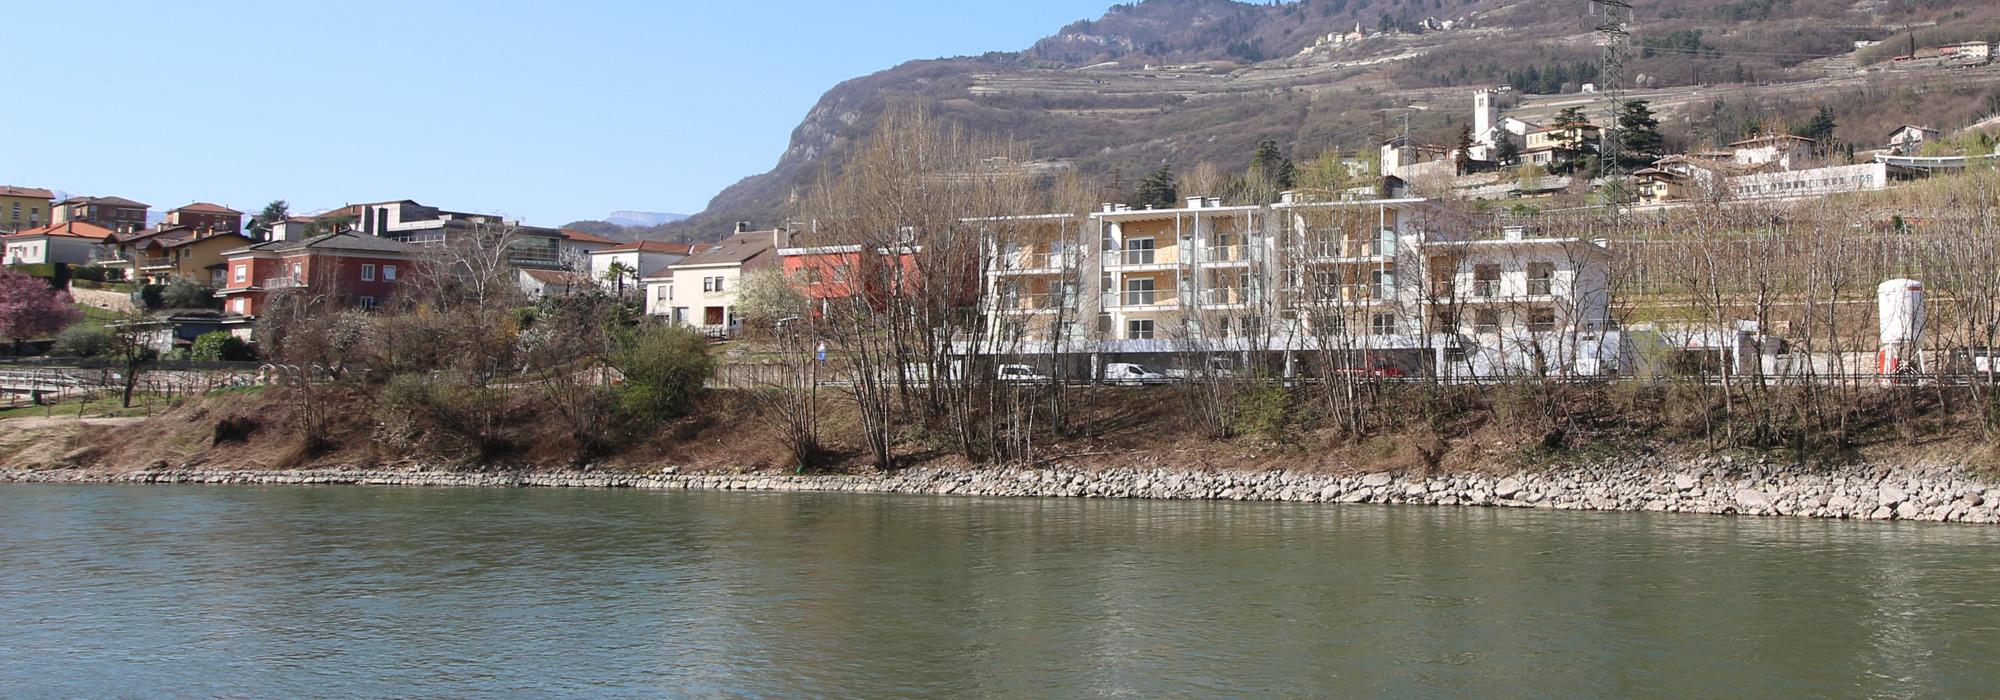 Nuova Residenza Lungadige | Isera-Sacco, Via Lungadige